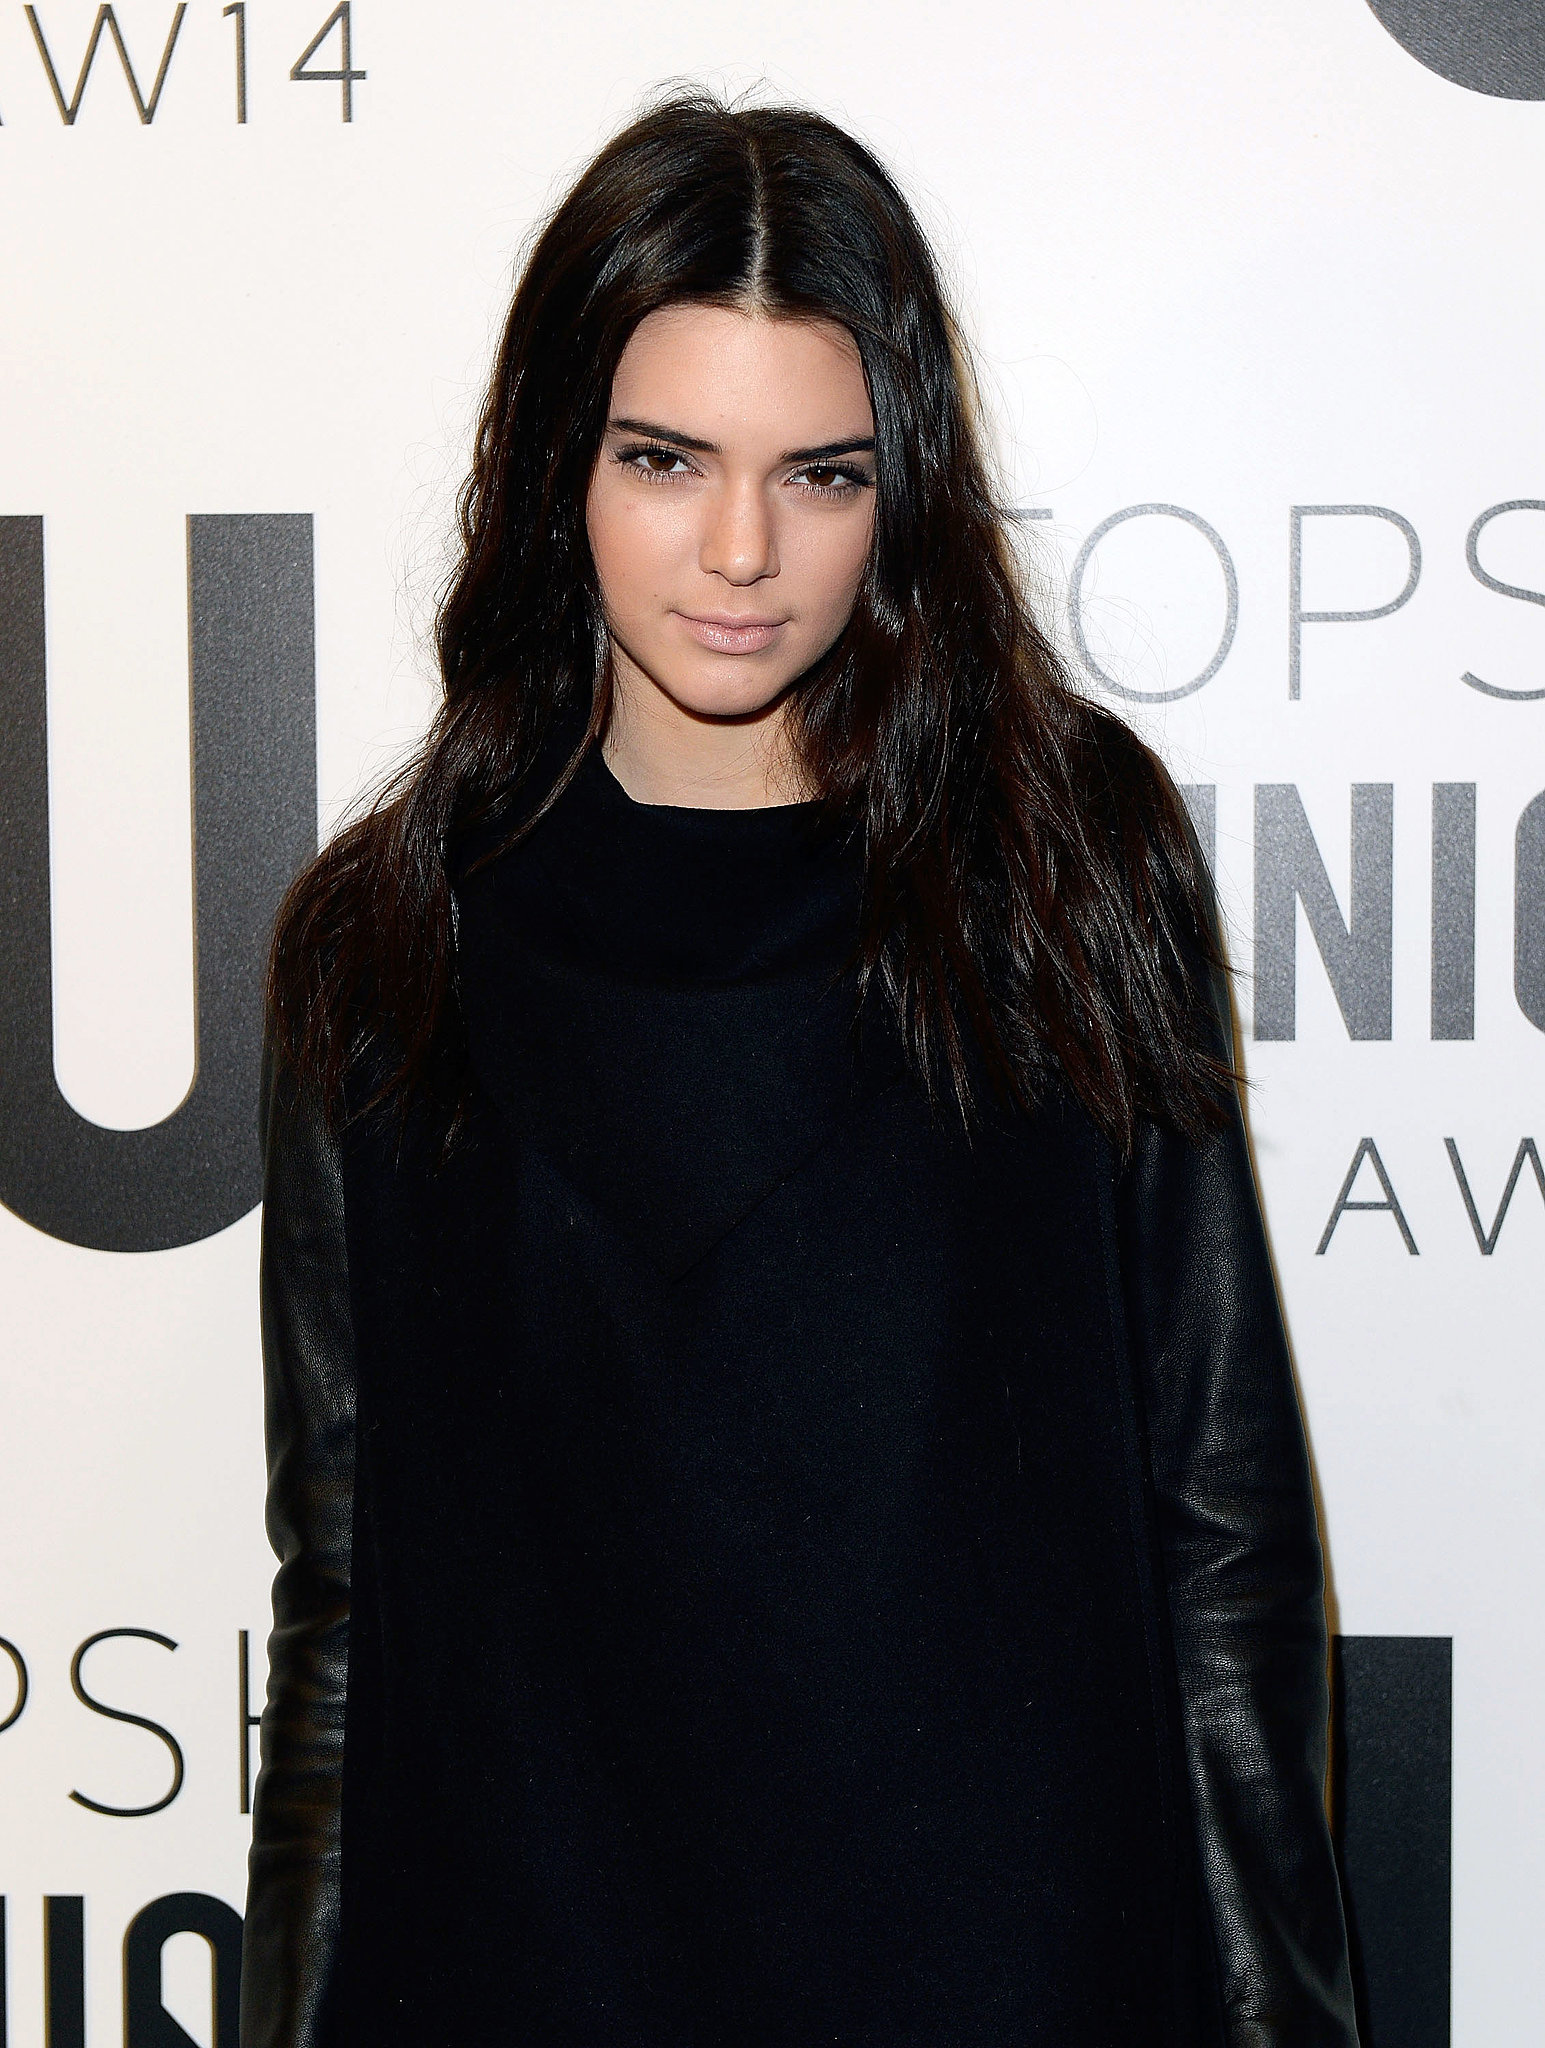 Kendall Jenner at Topshop Unique